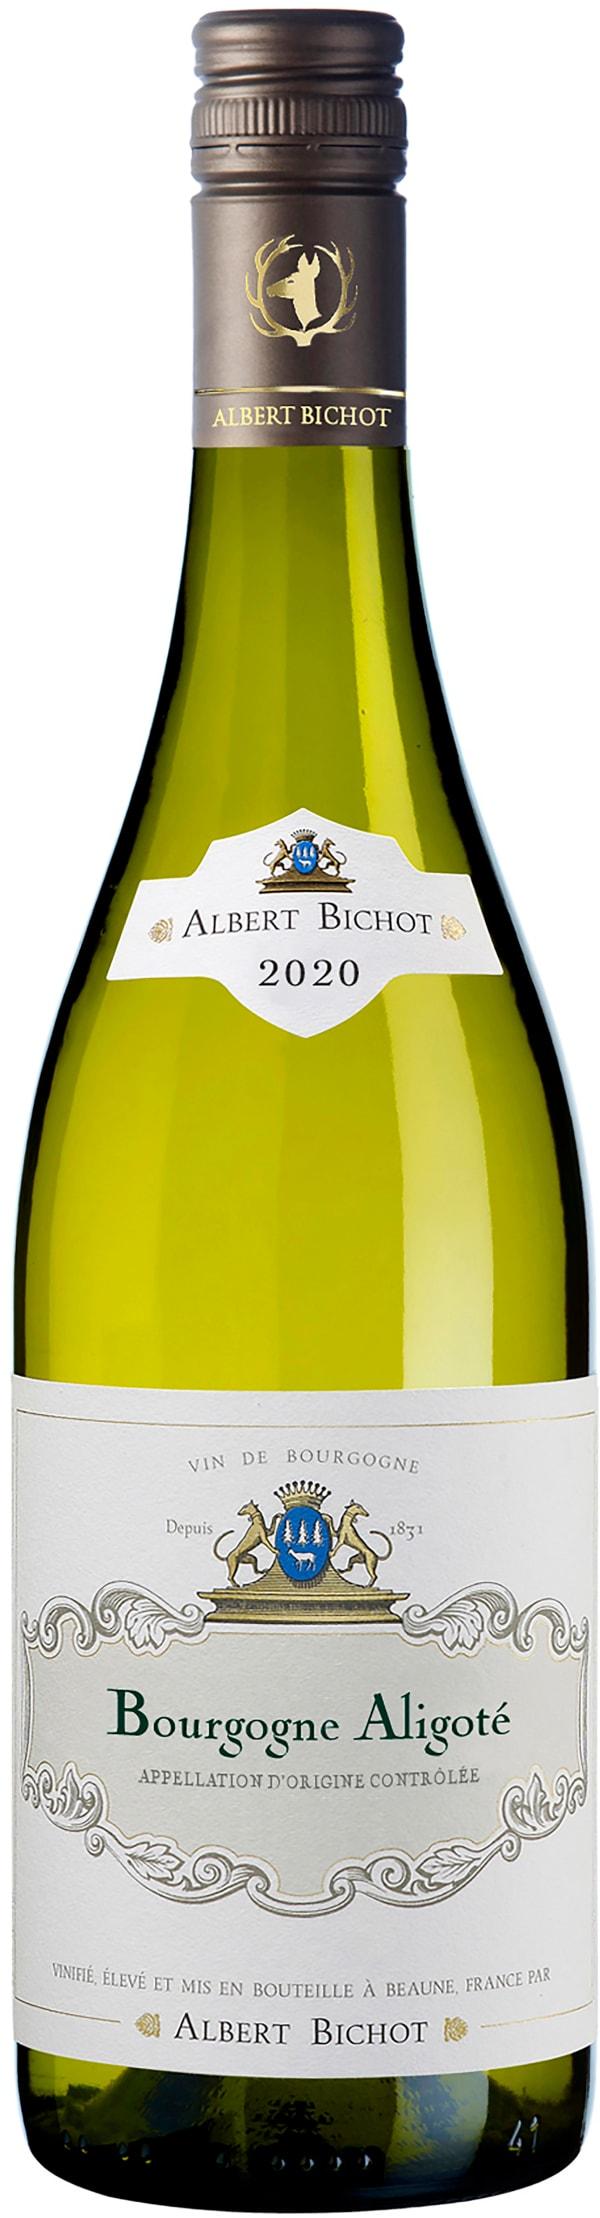 Albert Bichot Bourgogne Aligoté 2020